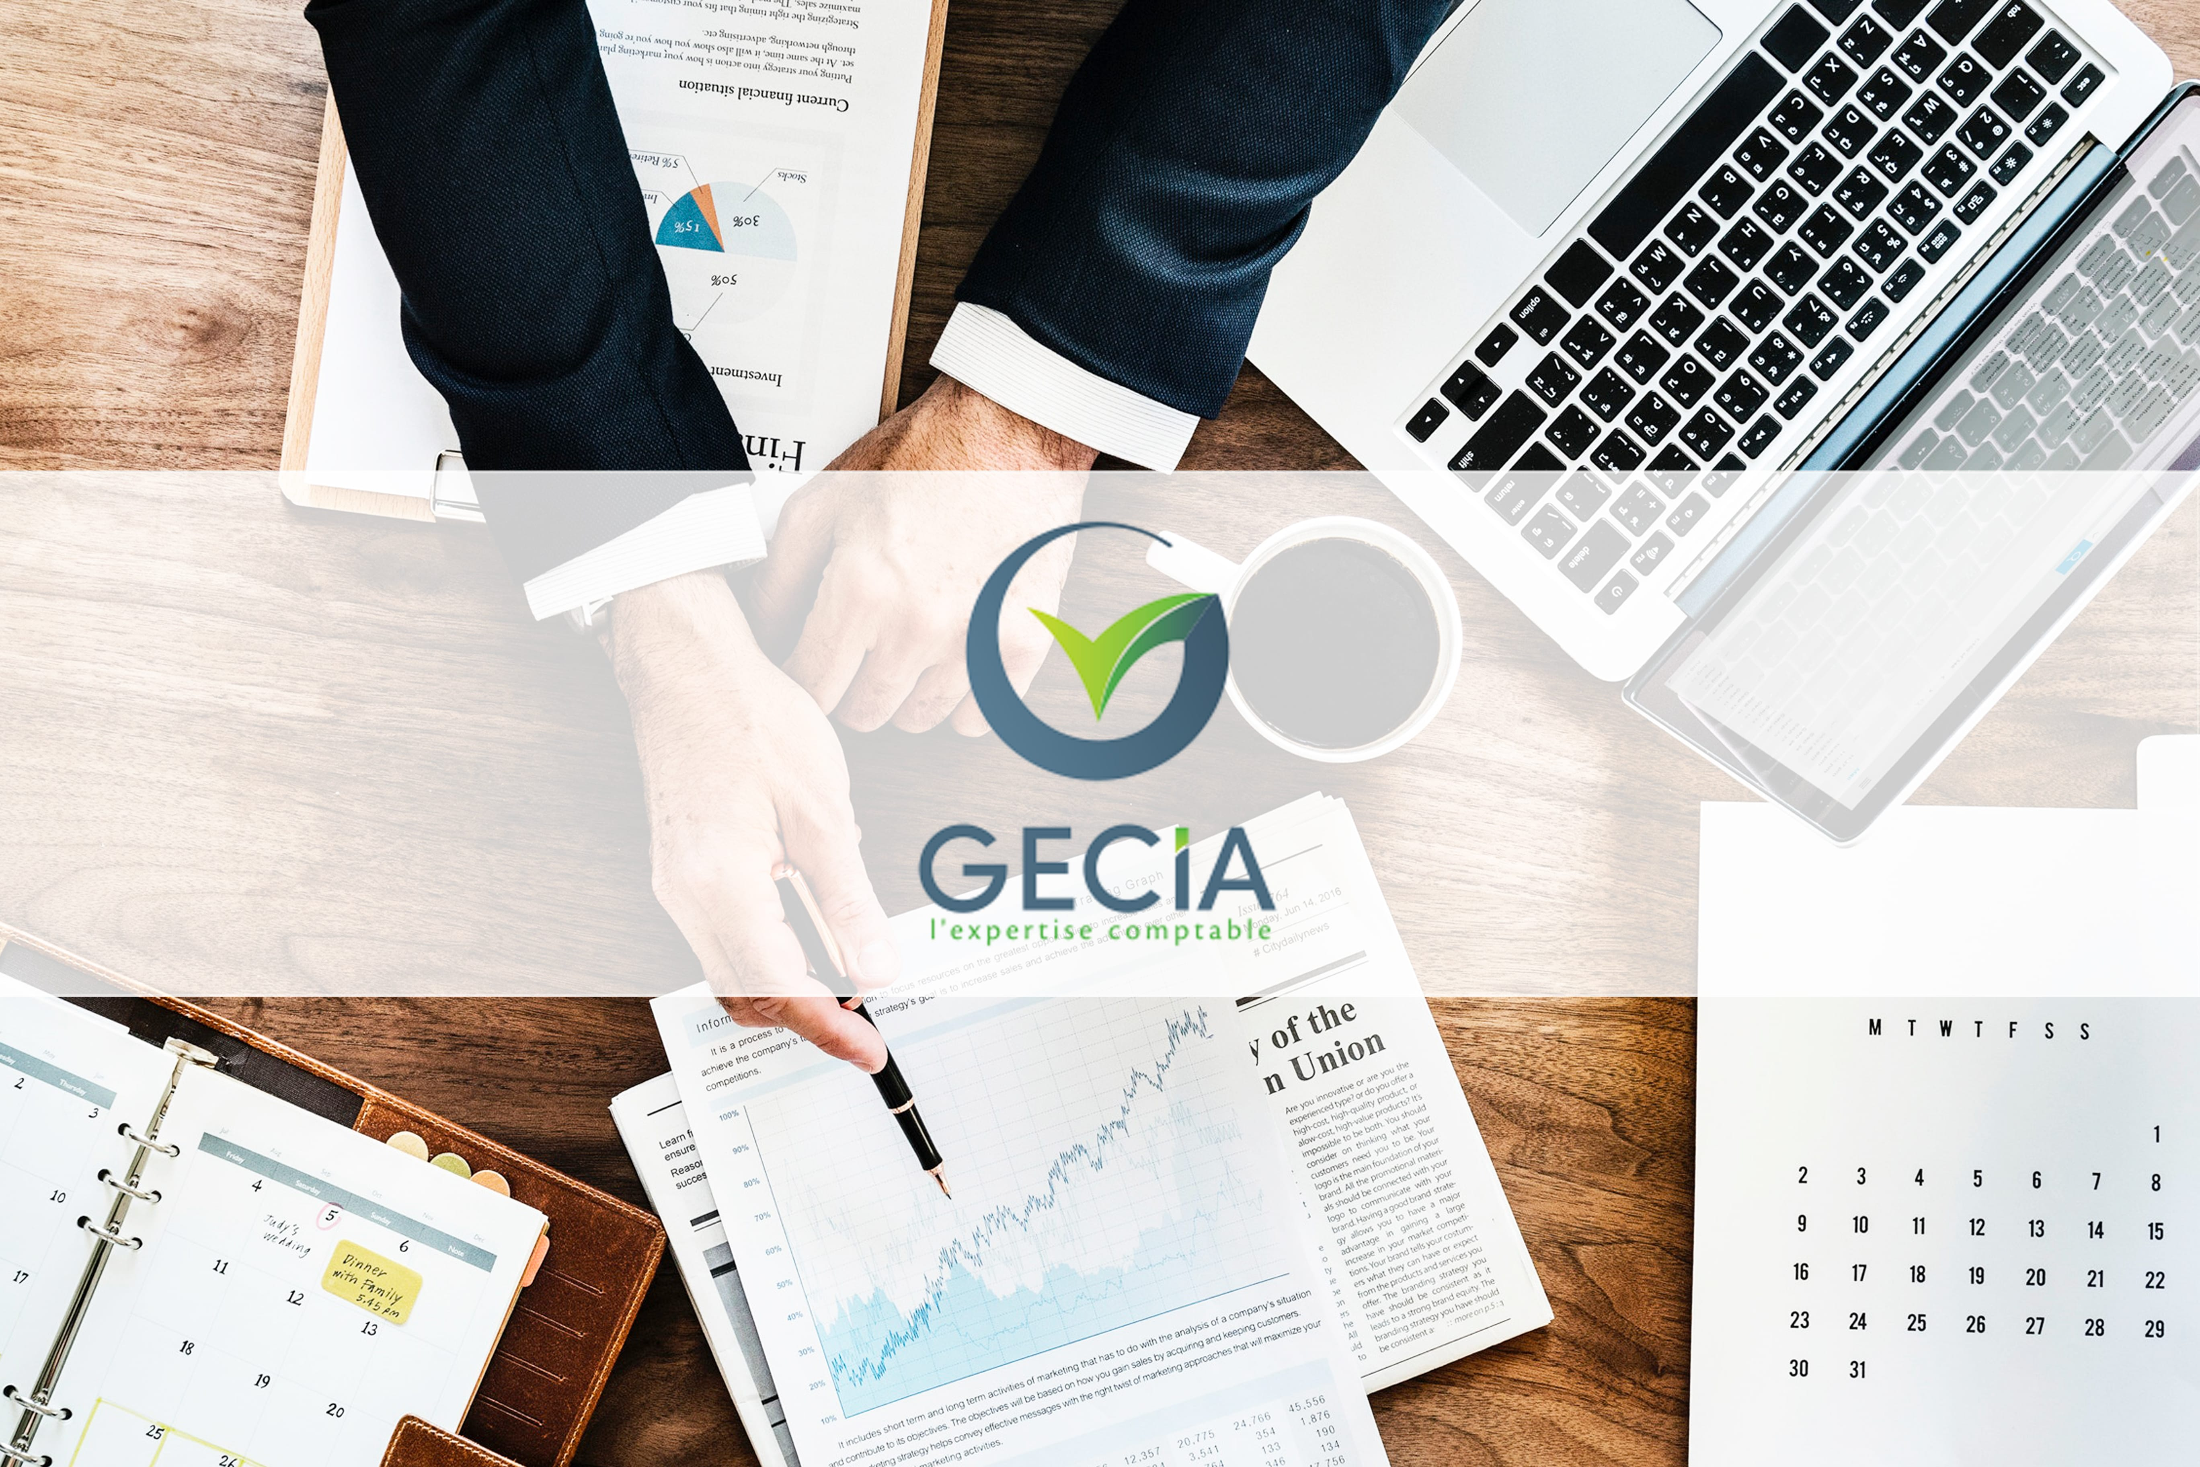 Gecia-expert-comptable-aix-en-provence-pelissanne-miramas-salon-de-provence